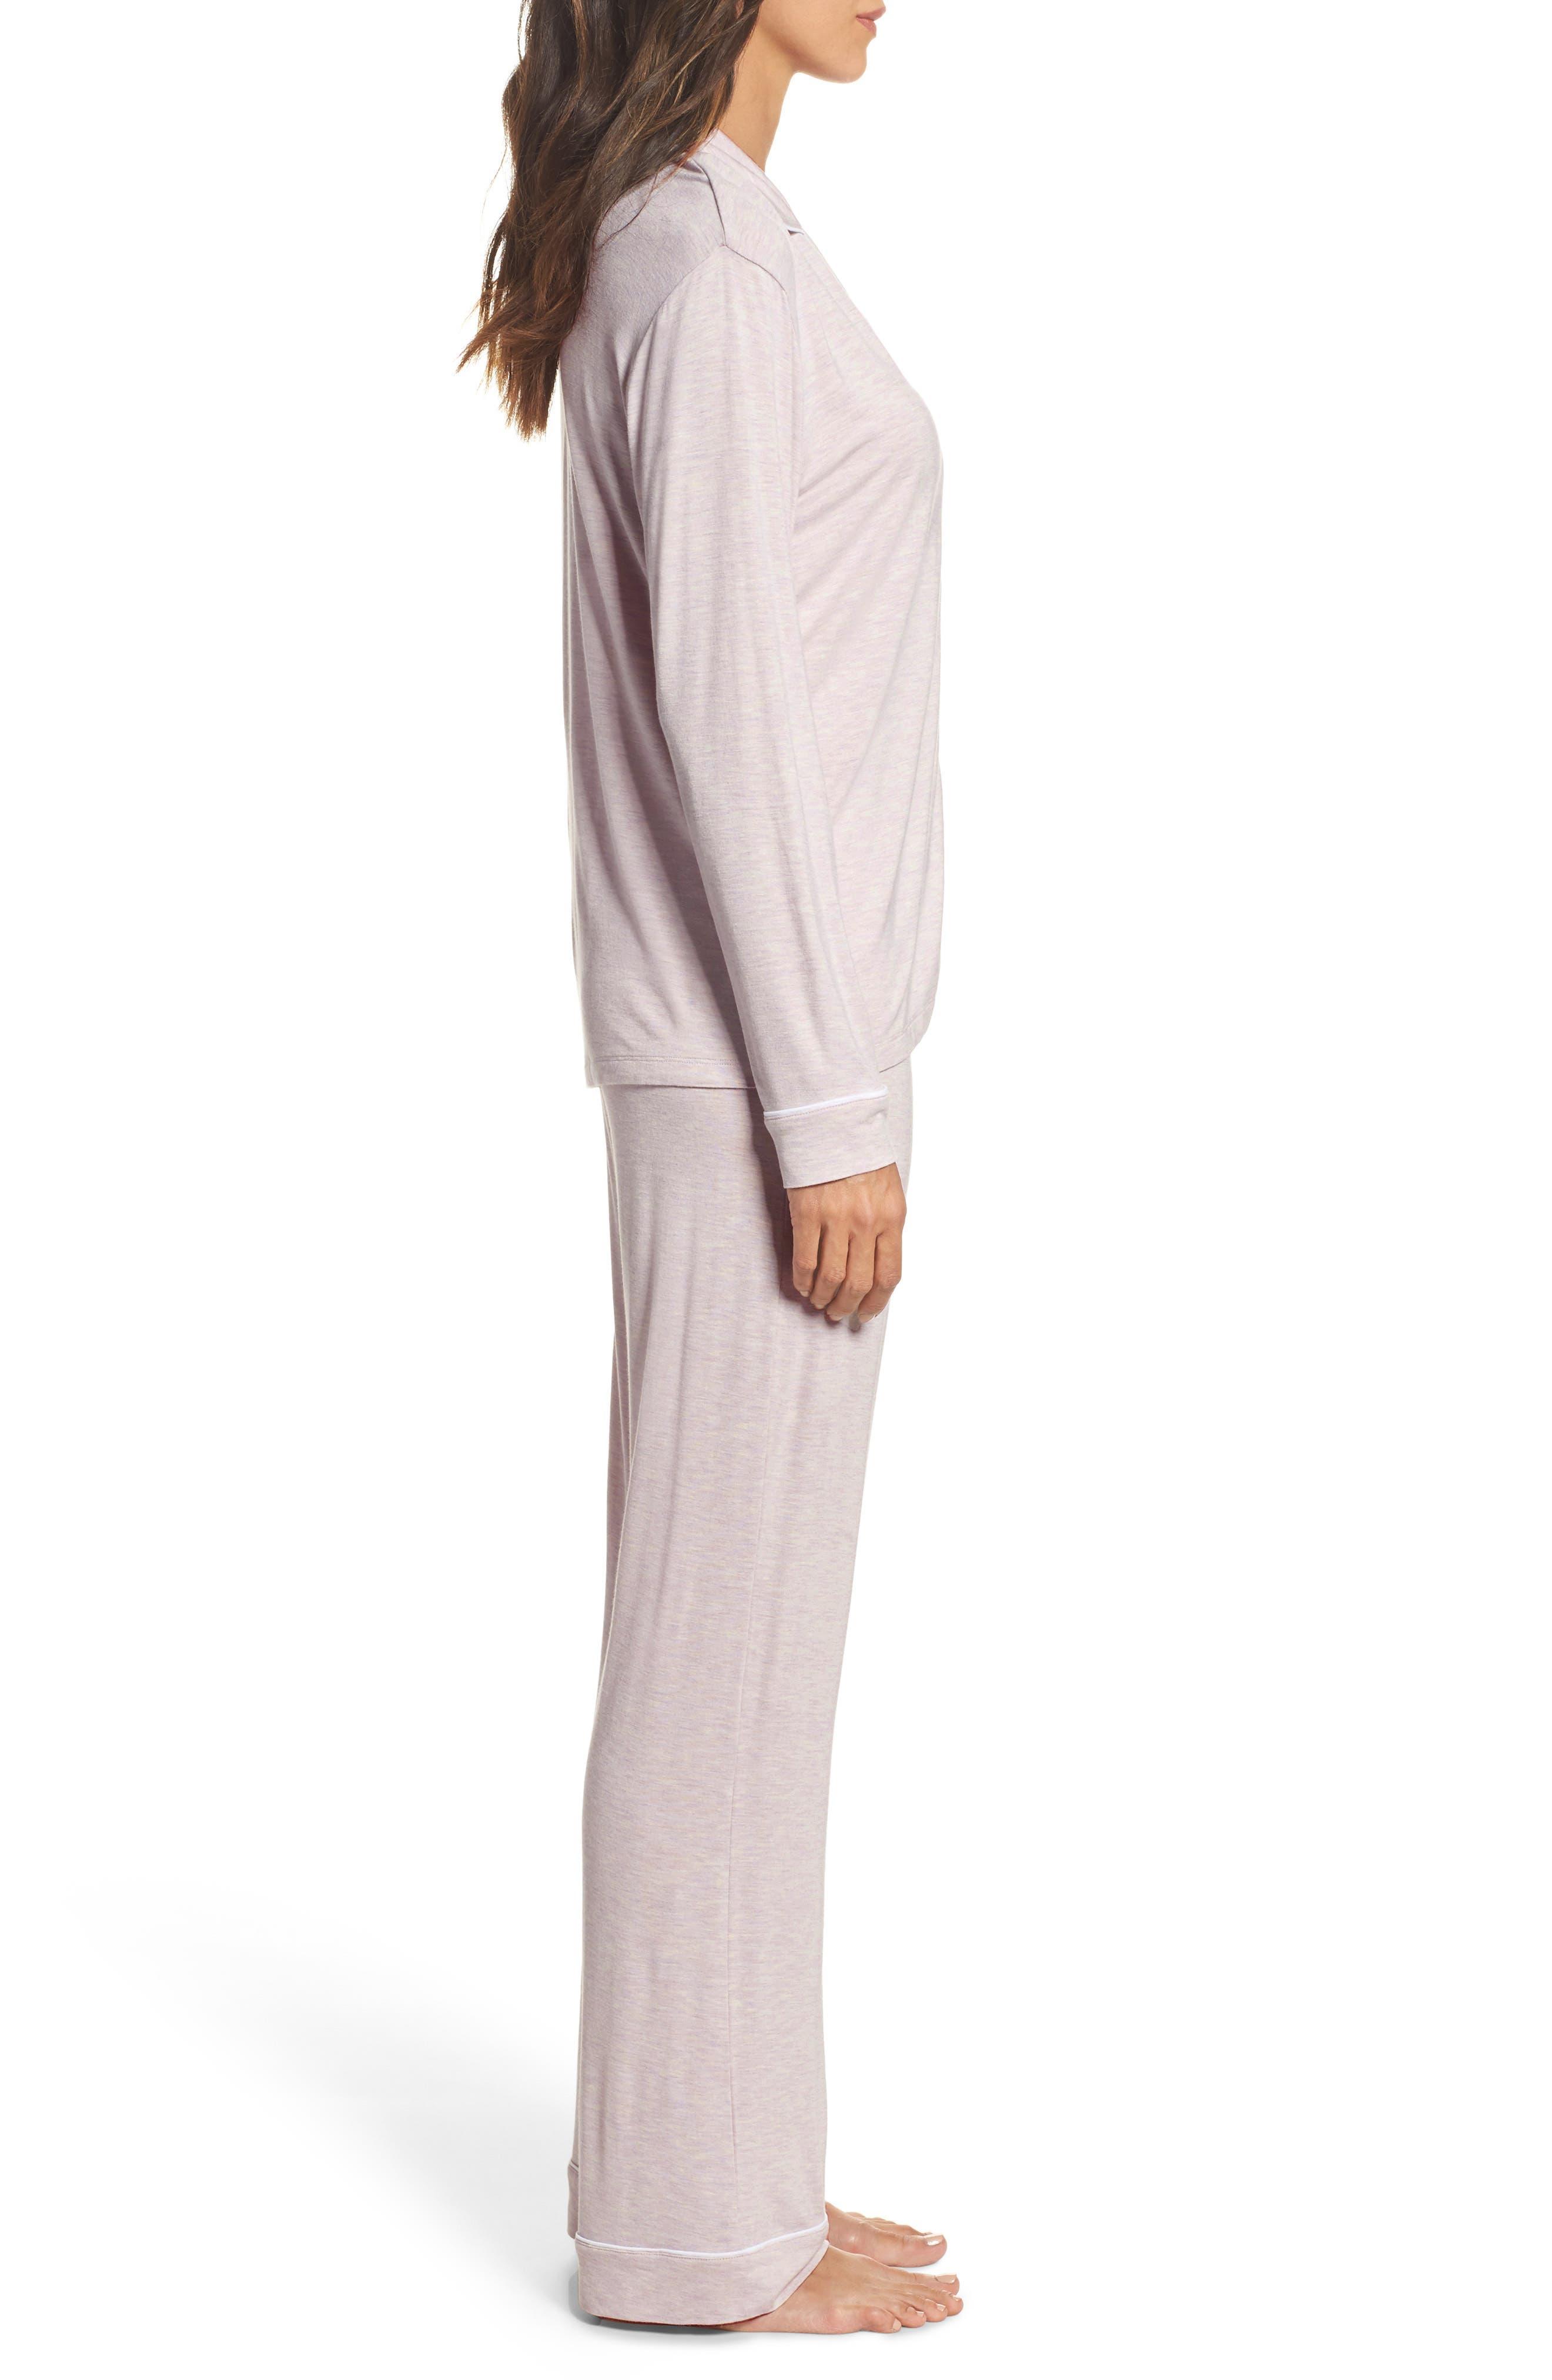 Lenon Jersey Pajamas,                             Alternate thumbnail 3, color,                             Lavender Fog Heather